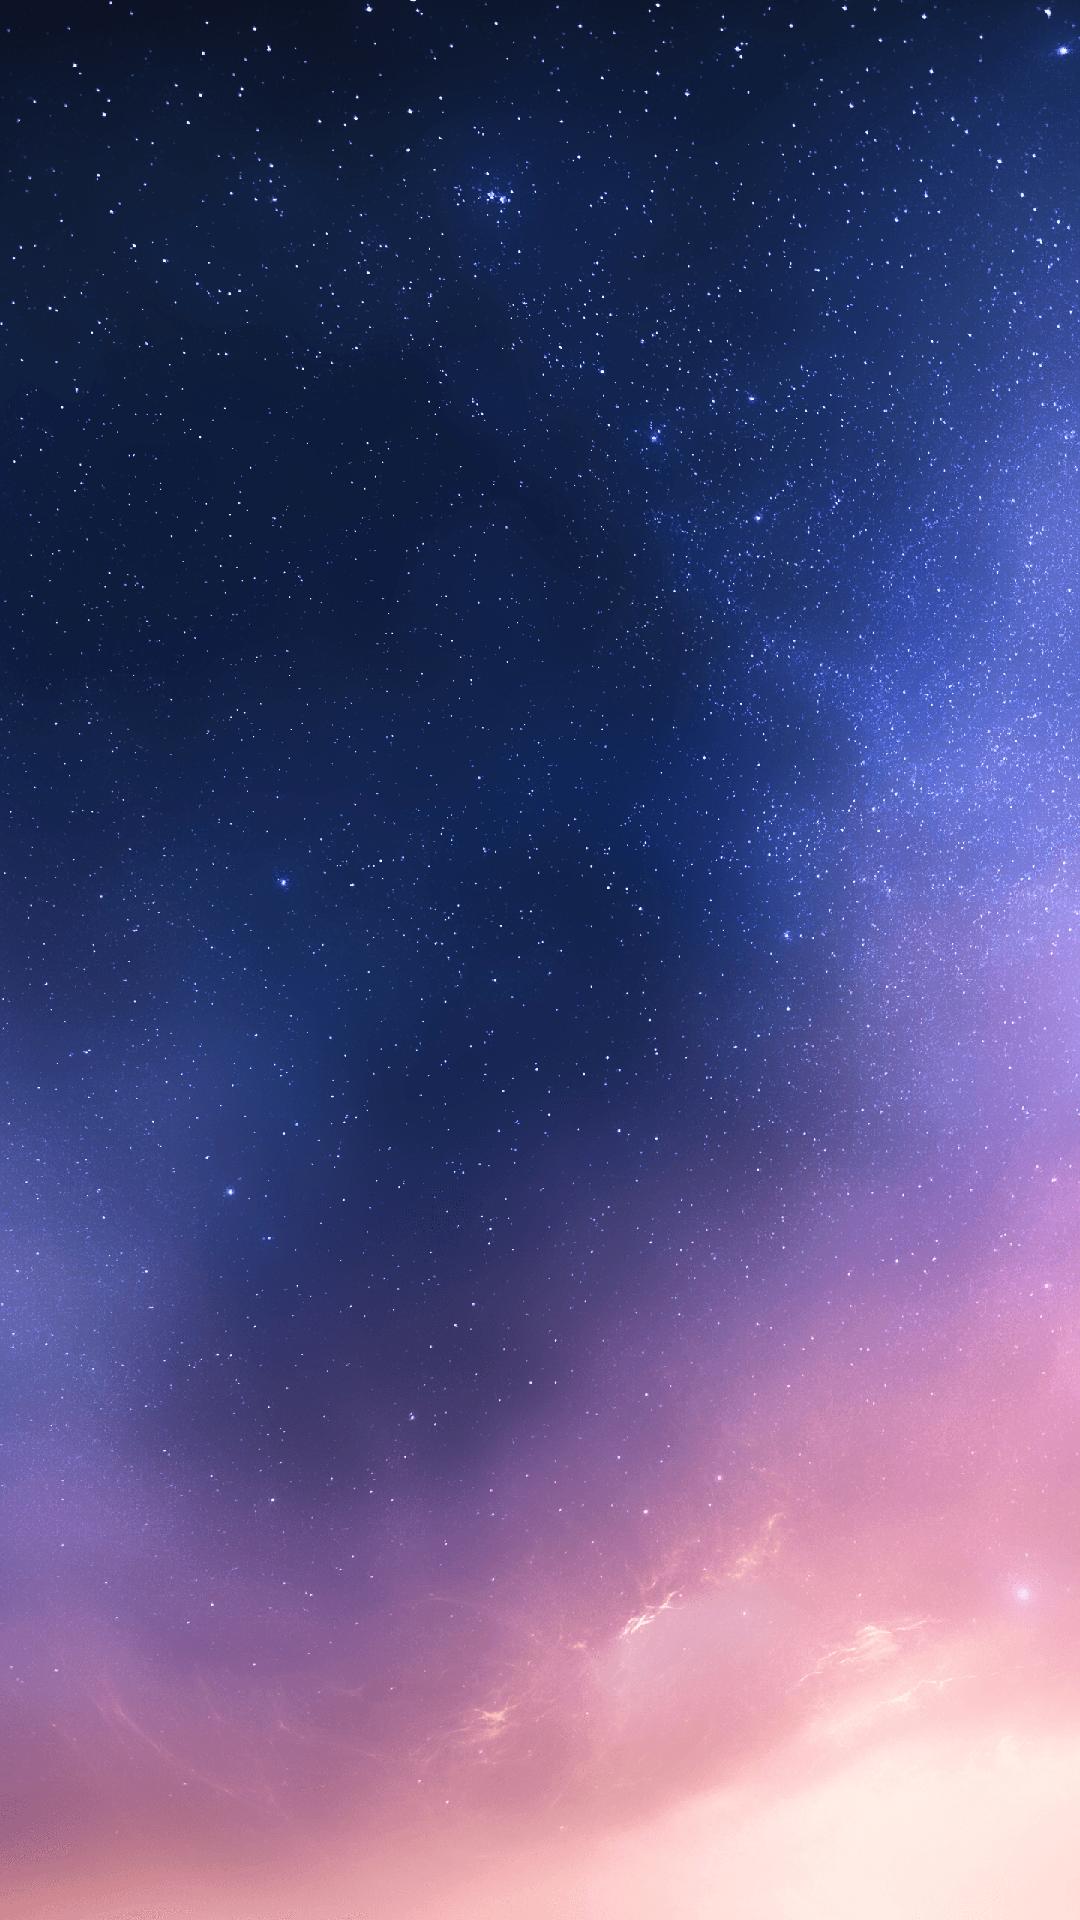 Unduh 5700 Wallpaper Oppo A37 HD Terbaru